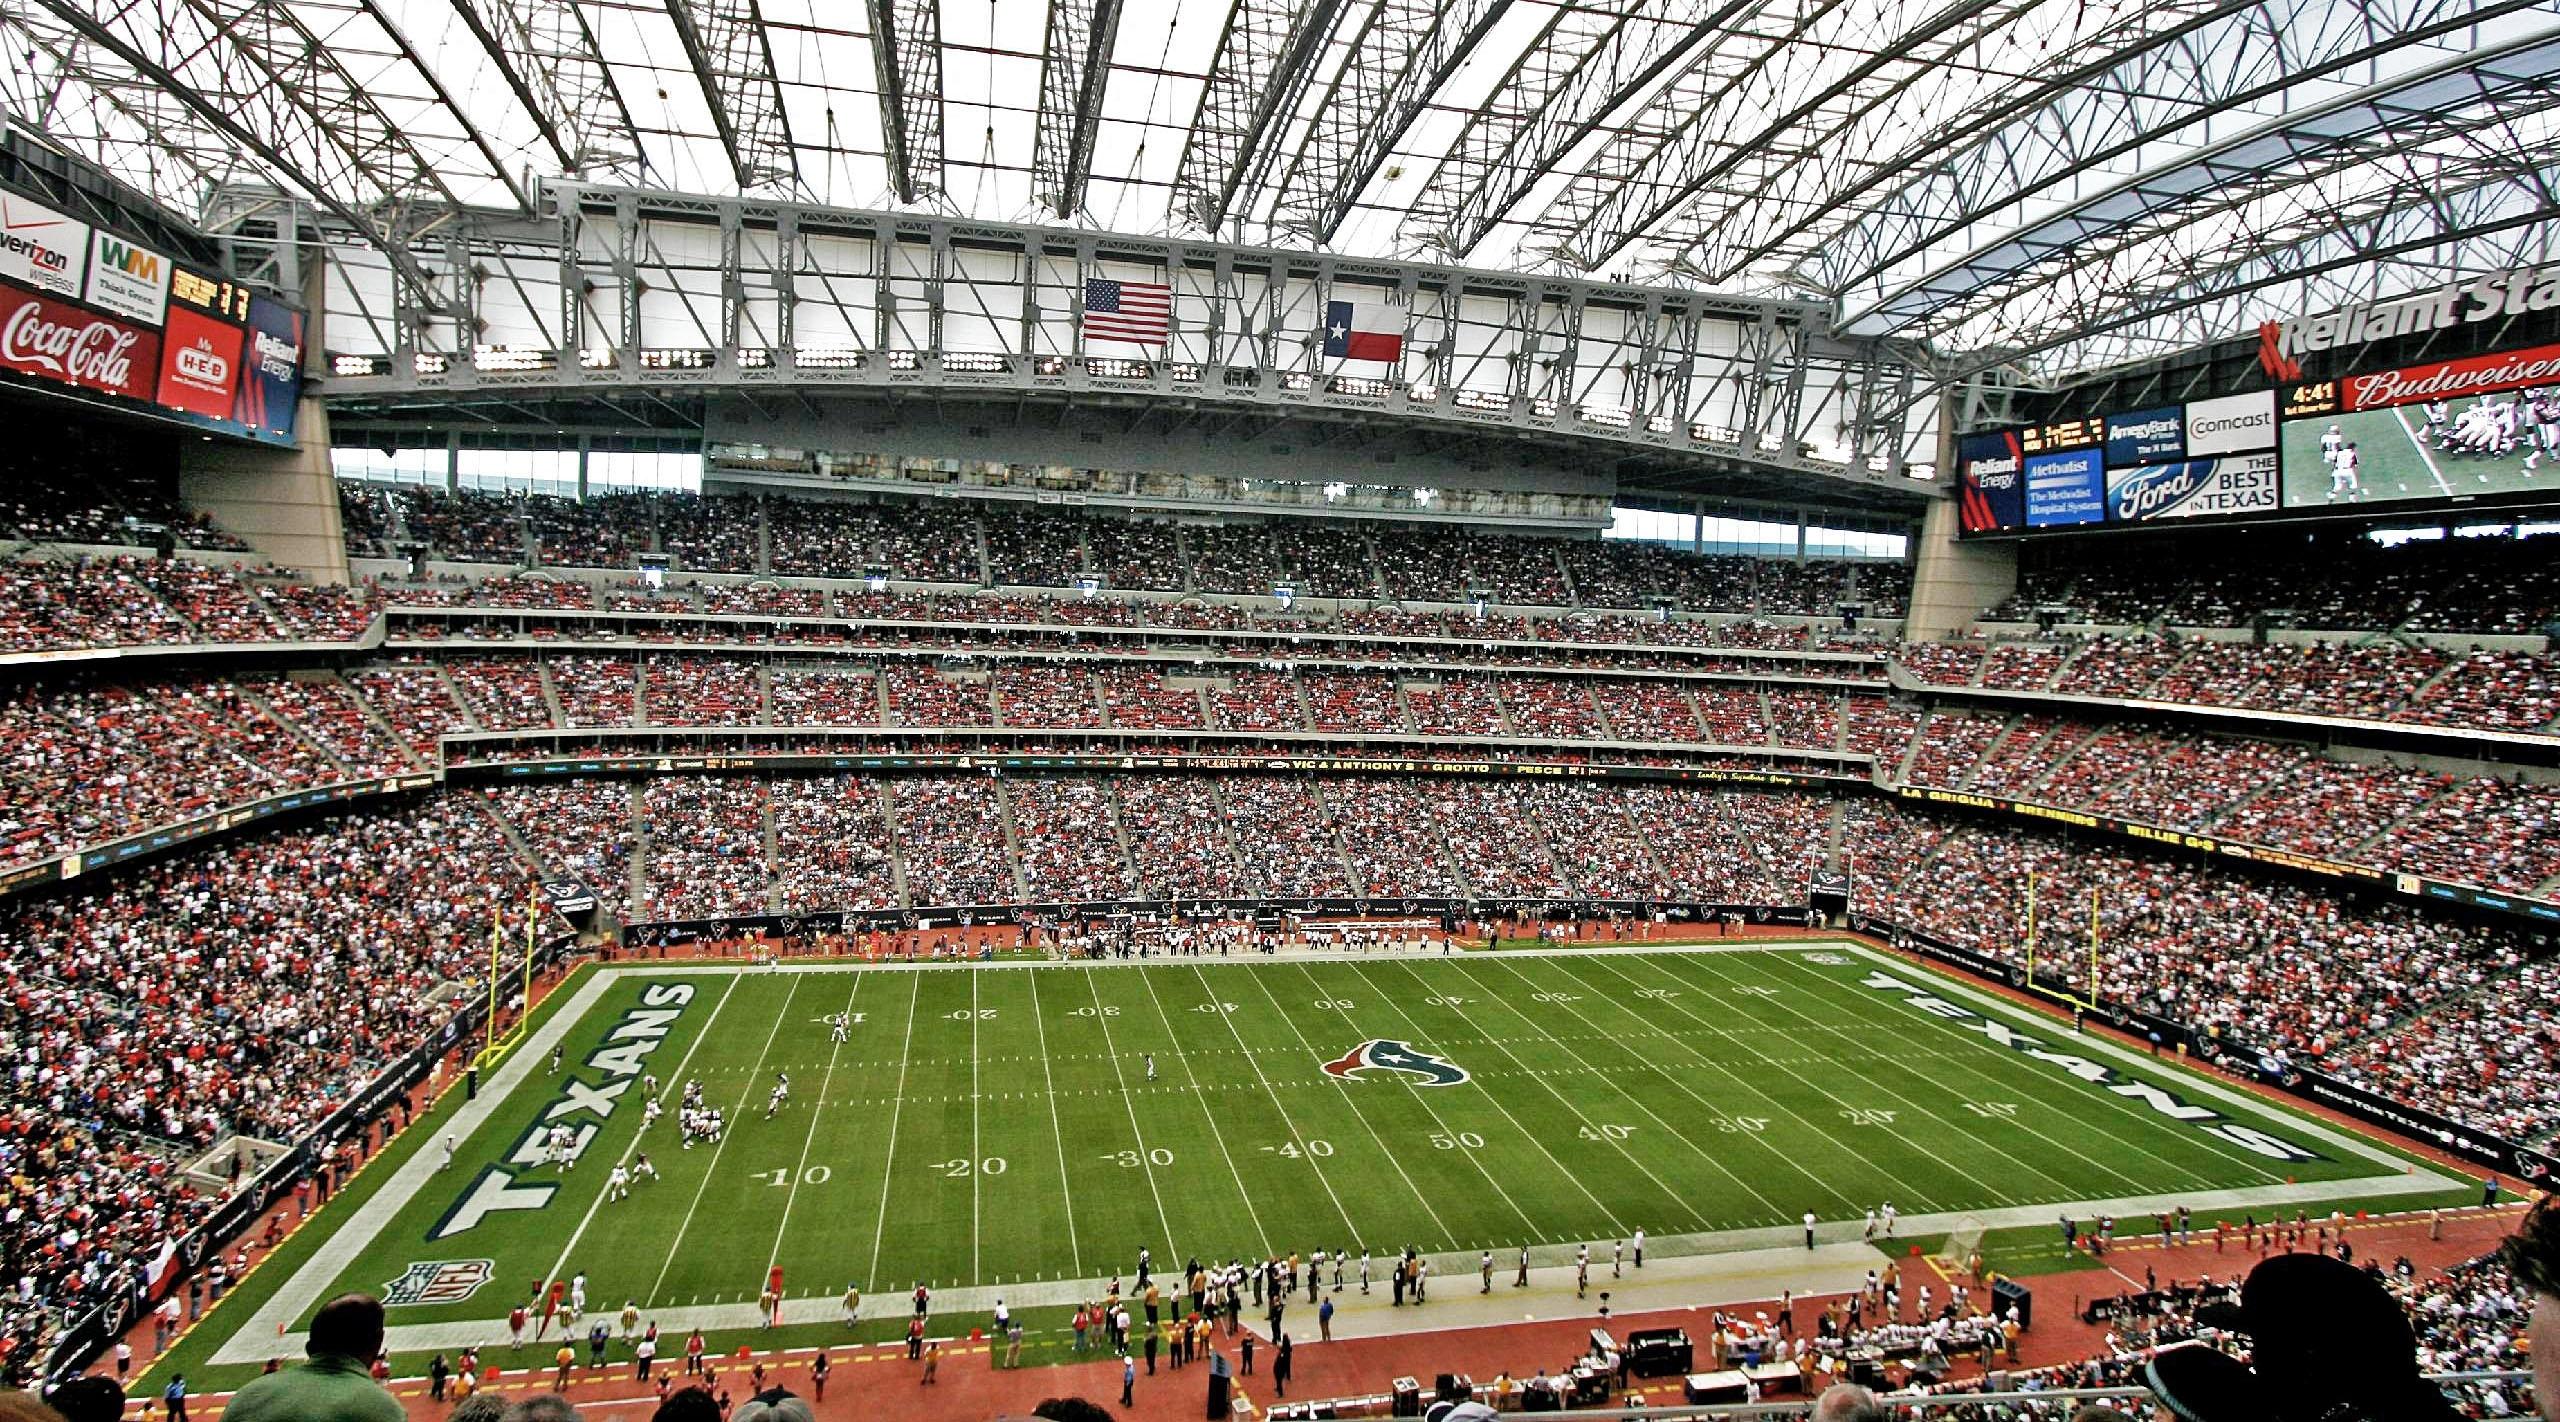 Nrg Stadium - Wikipedia within Super Bowl Seating Capacity Requirements